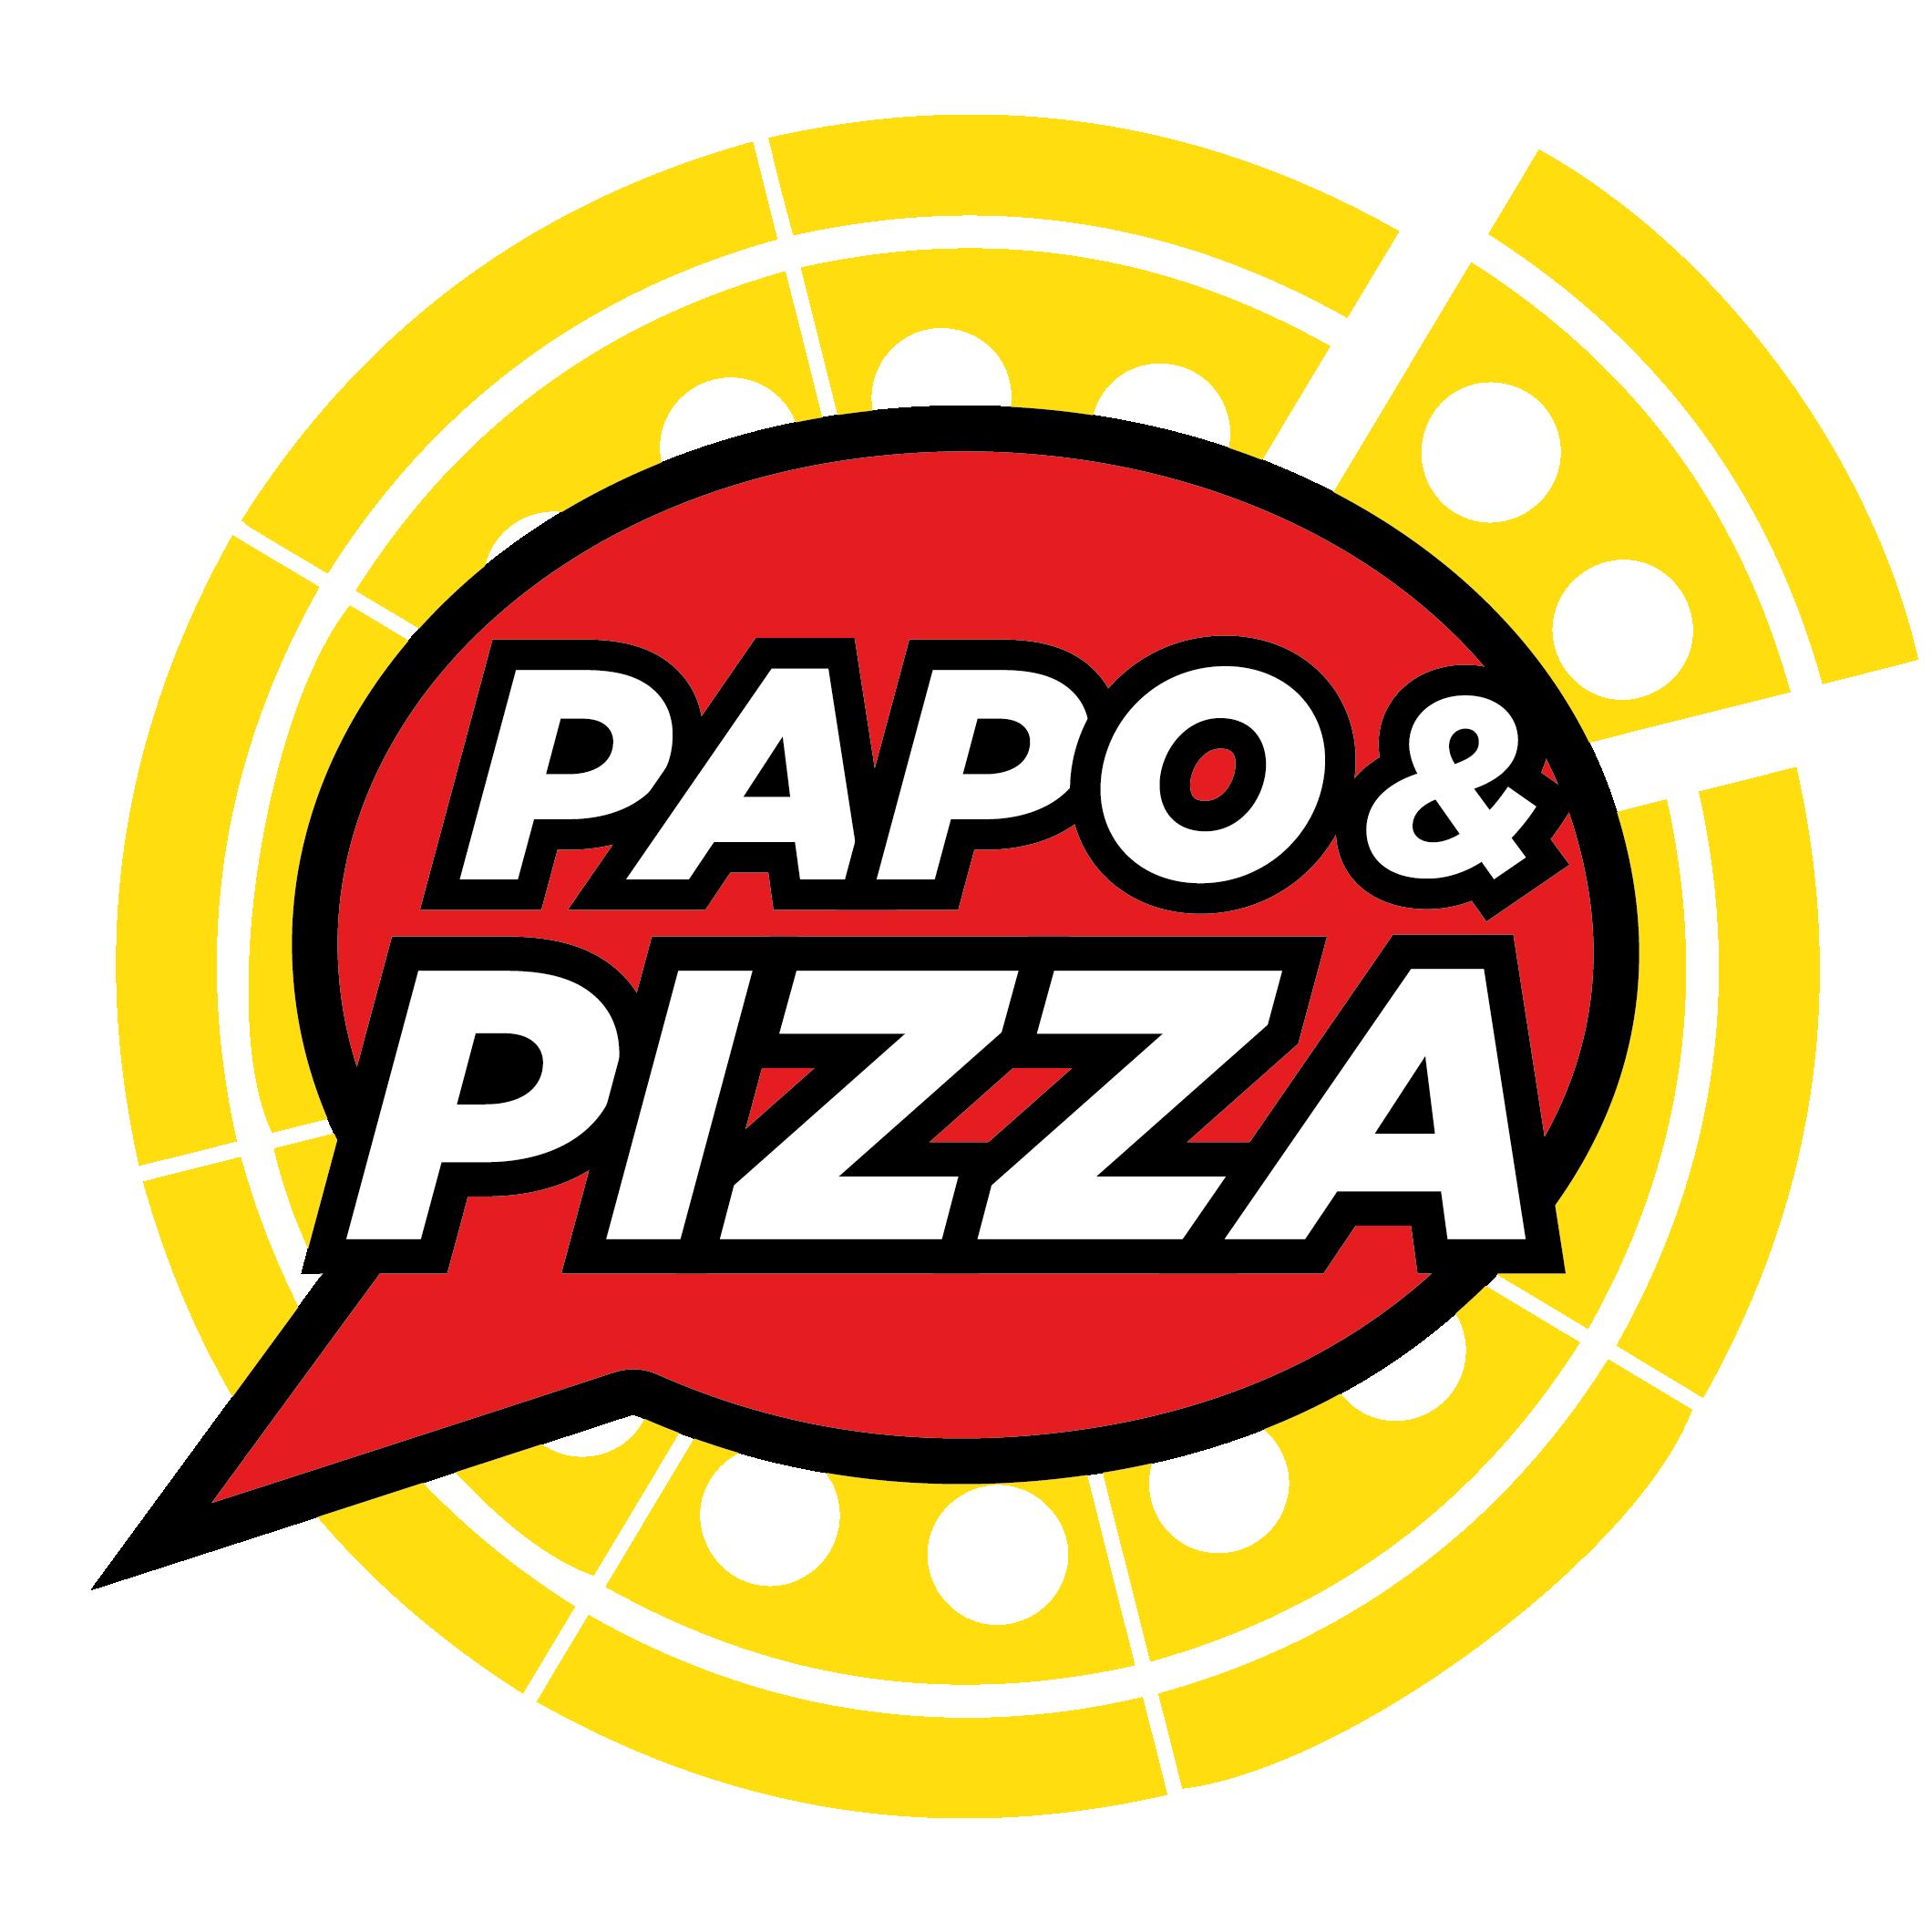 Papo e Pizza Podcast